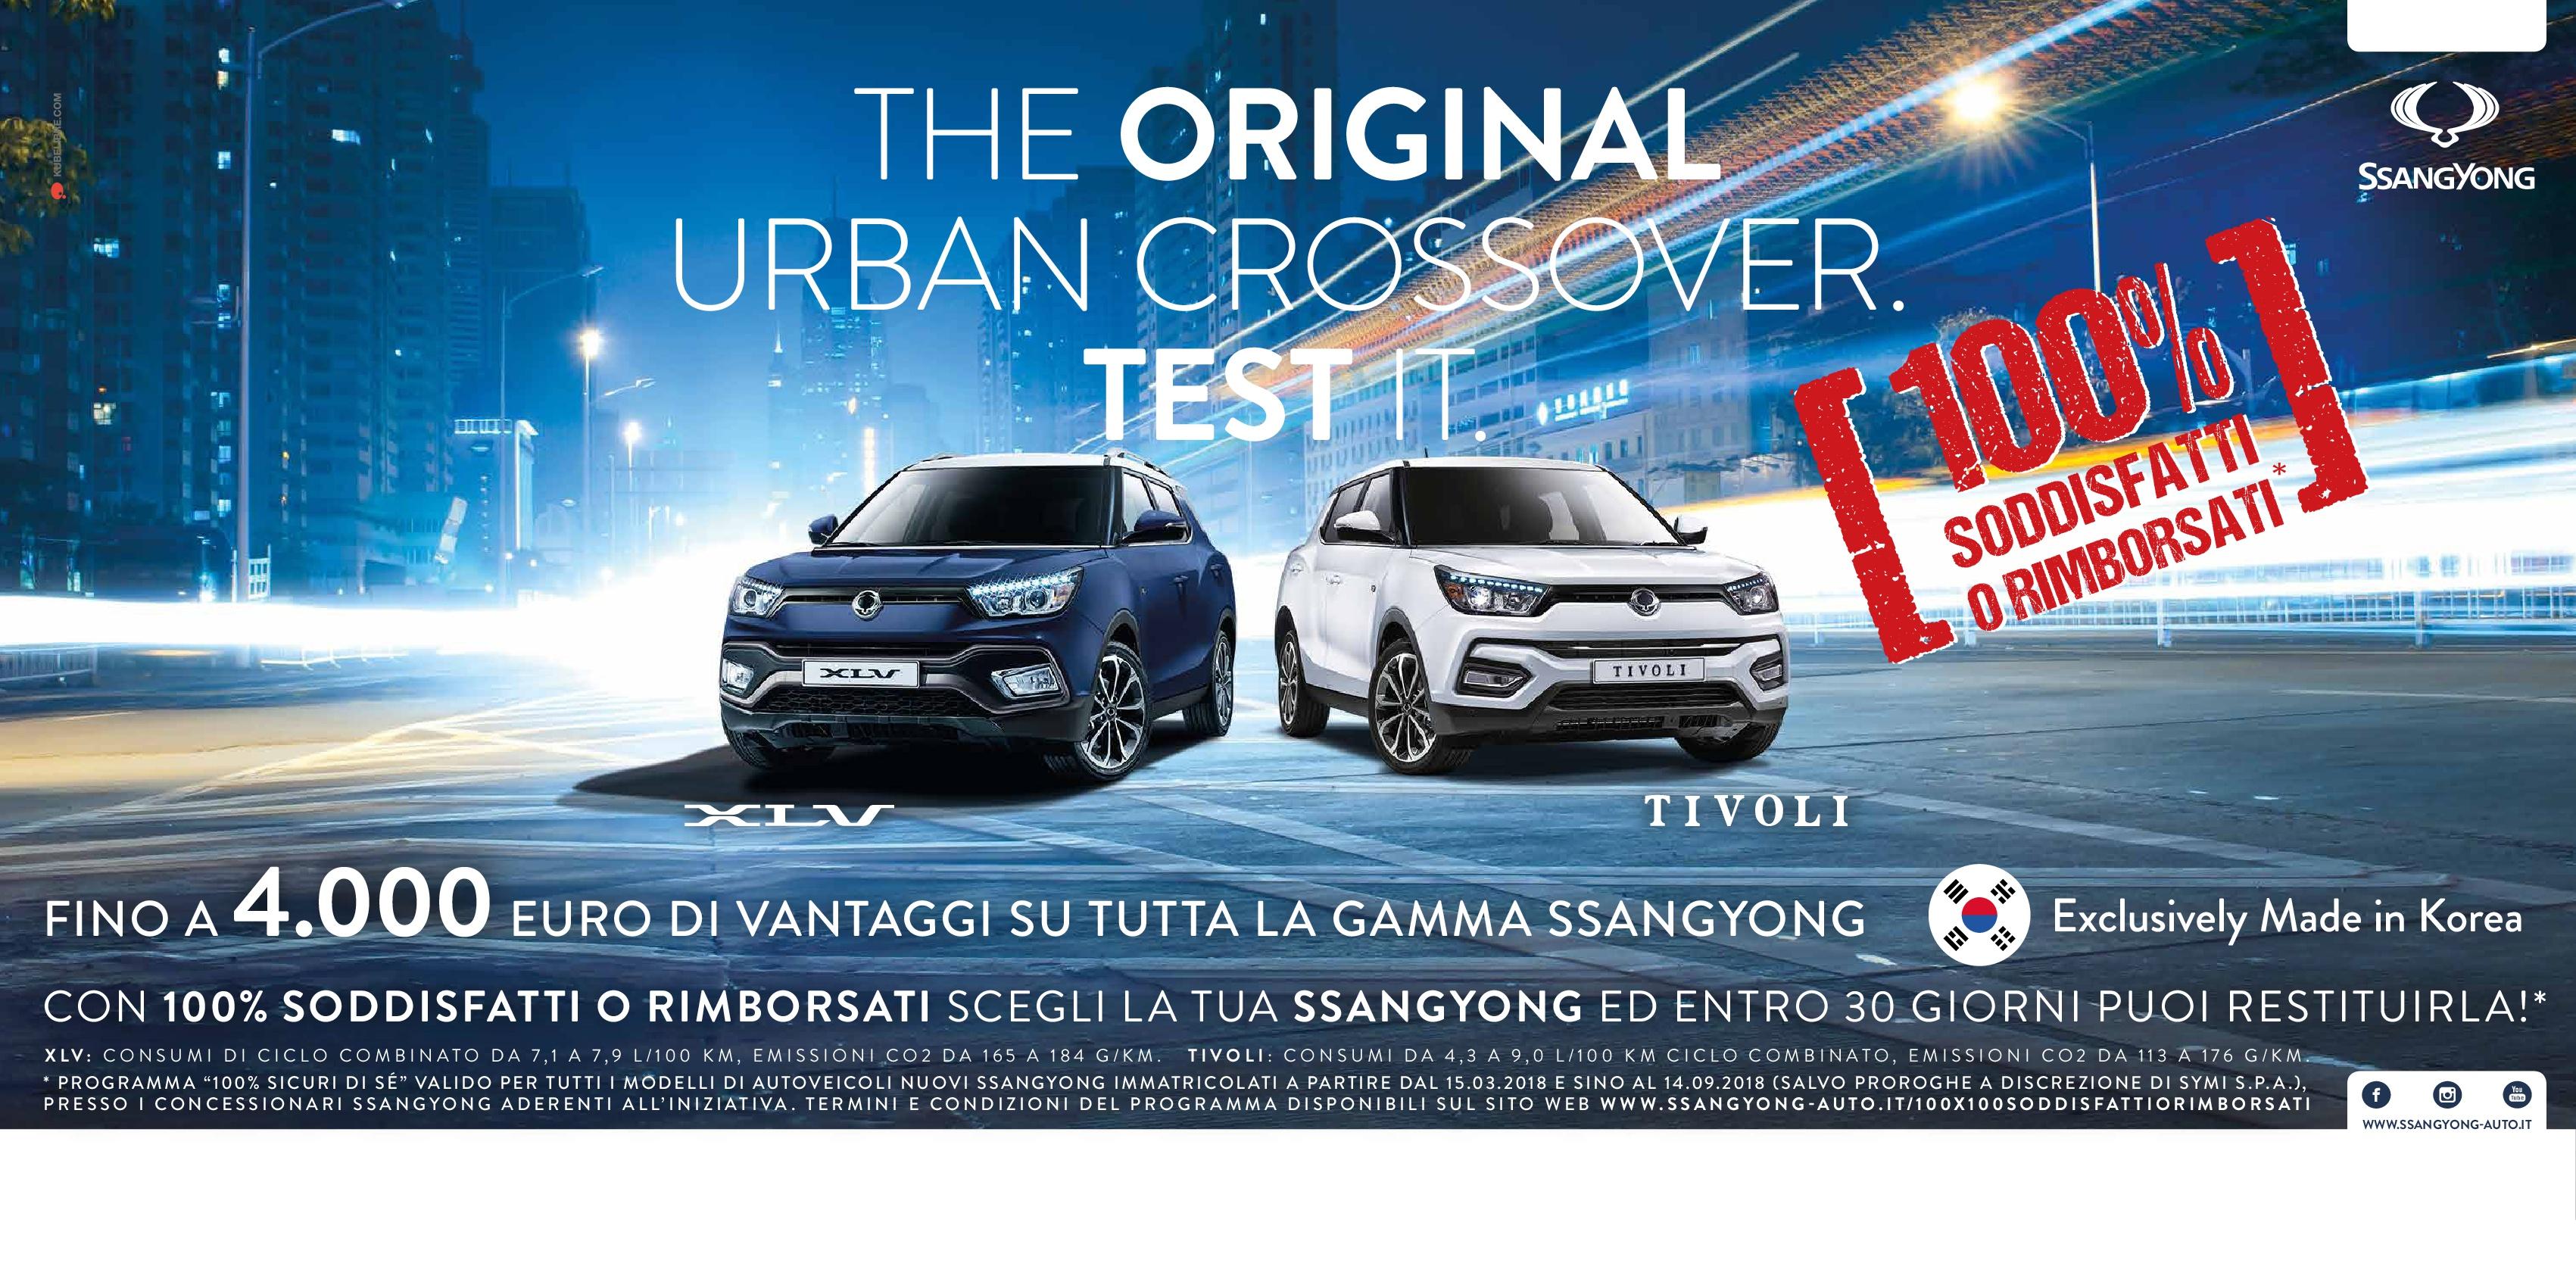 Urban Crossover!